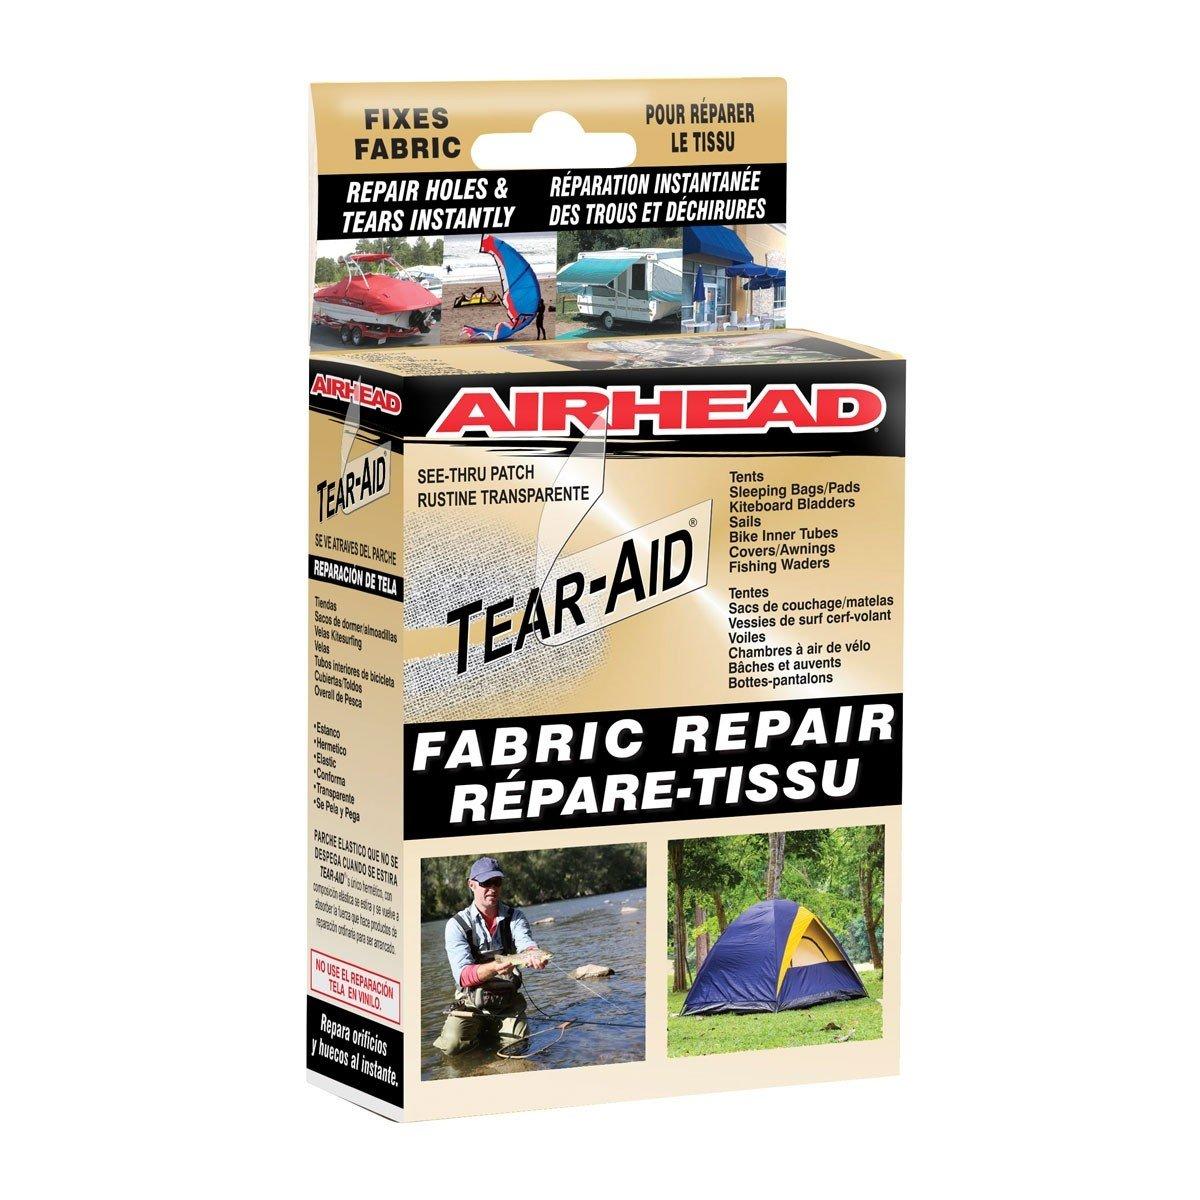 Kwik Tek Orange Cycle Parts Tear Aid Type A Fabric Repair Patch Kit by Airhead AHTR-1A by Kwik Tek